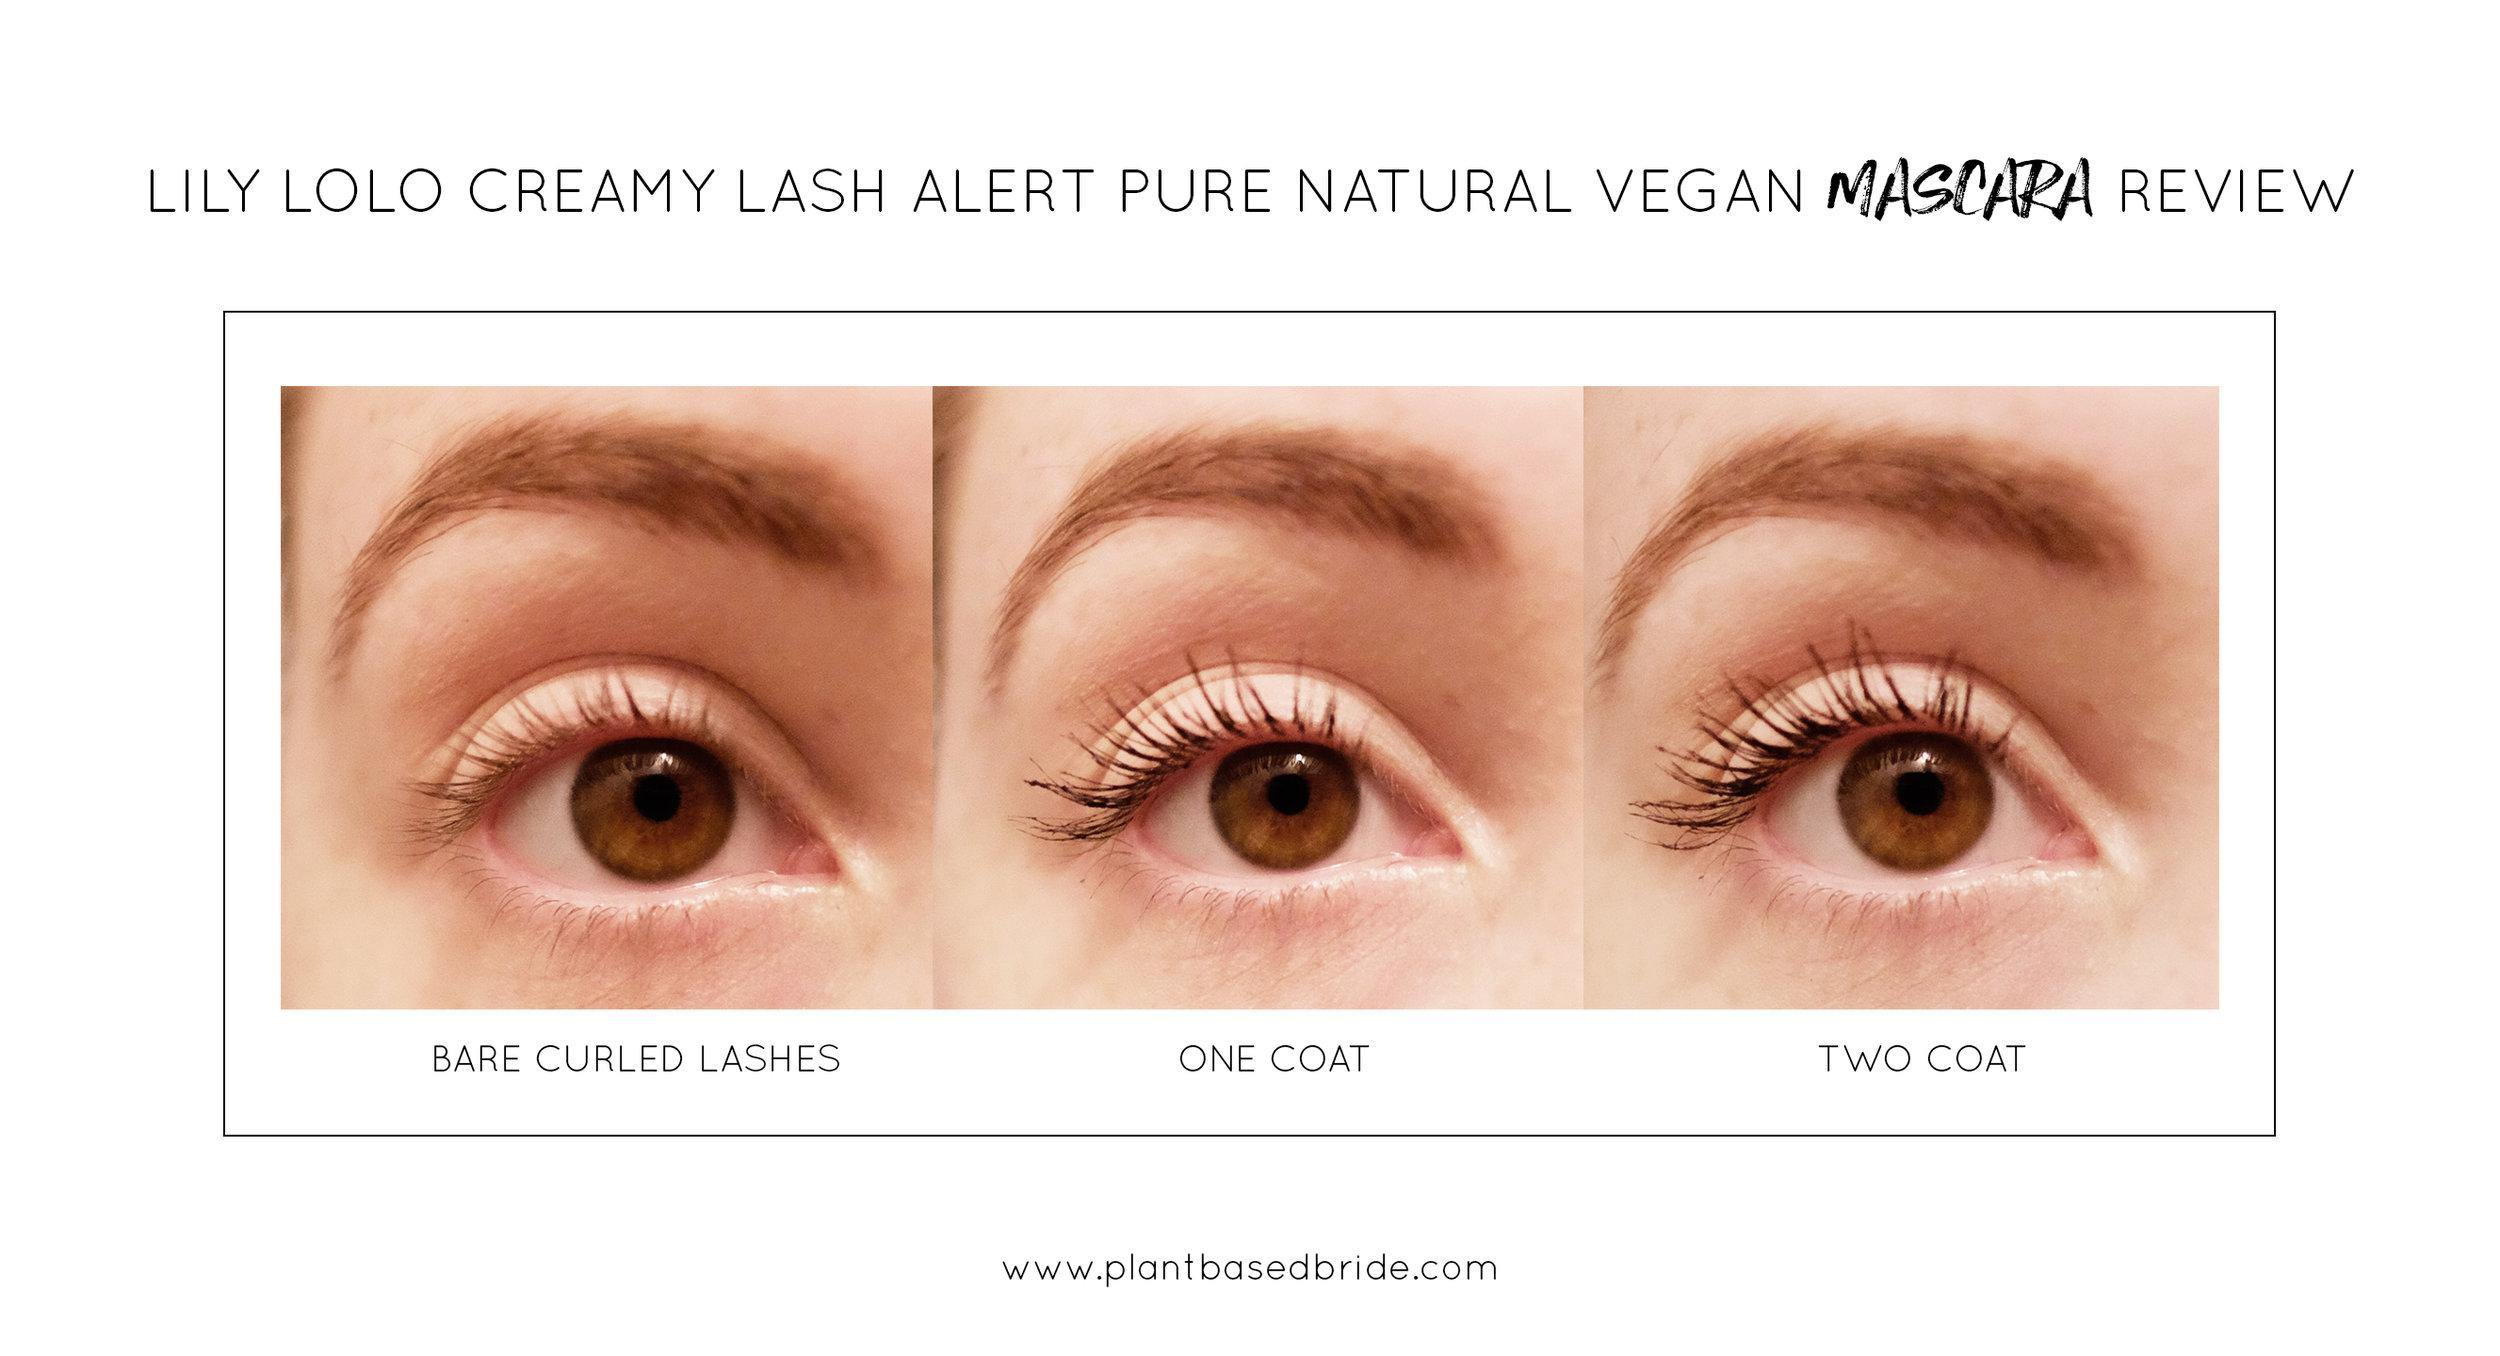 Lily Lolo Creamy Lash Alert Pure Natural Vegan Mascara Review // Plant Based Bride